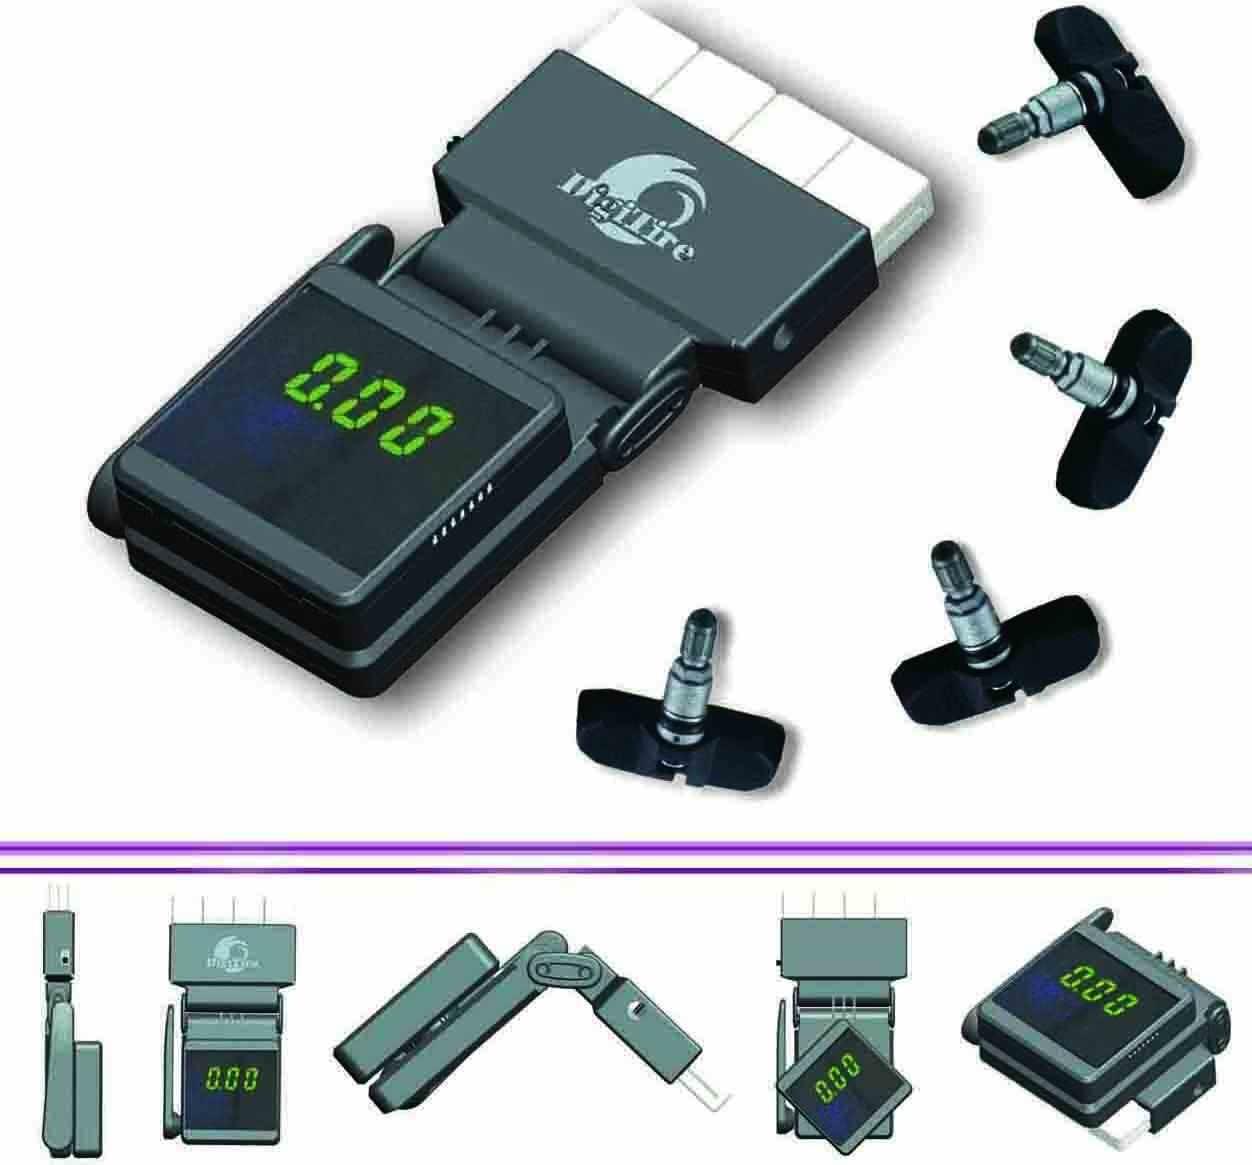 tire pressure monitoring system. Black Bedroom Furniture Sets. Home Design Ideas